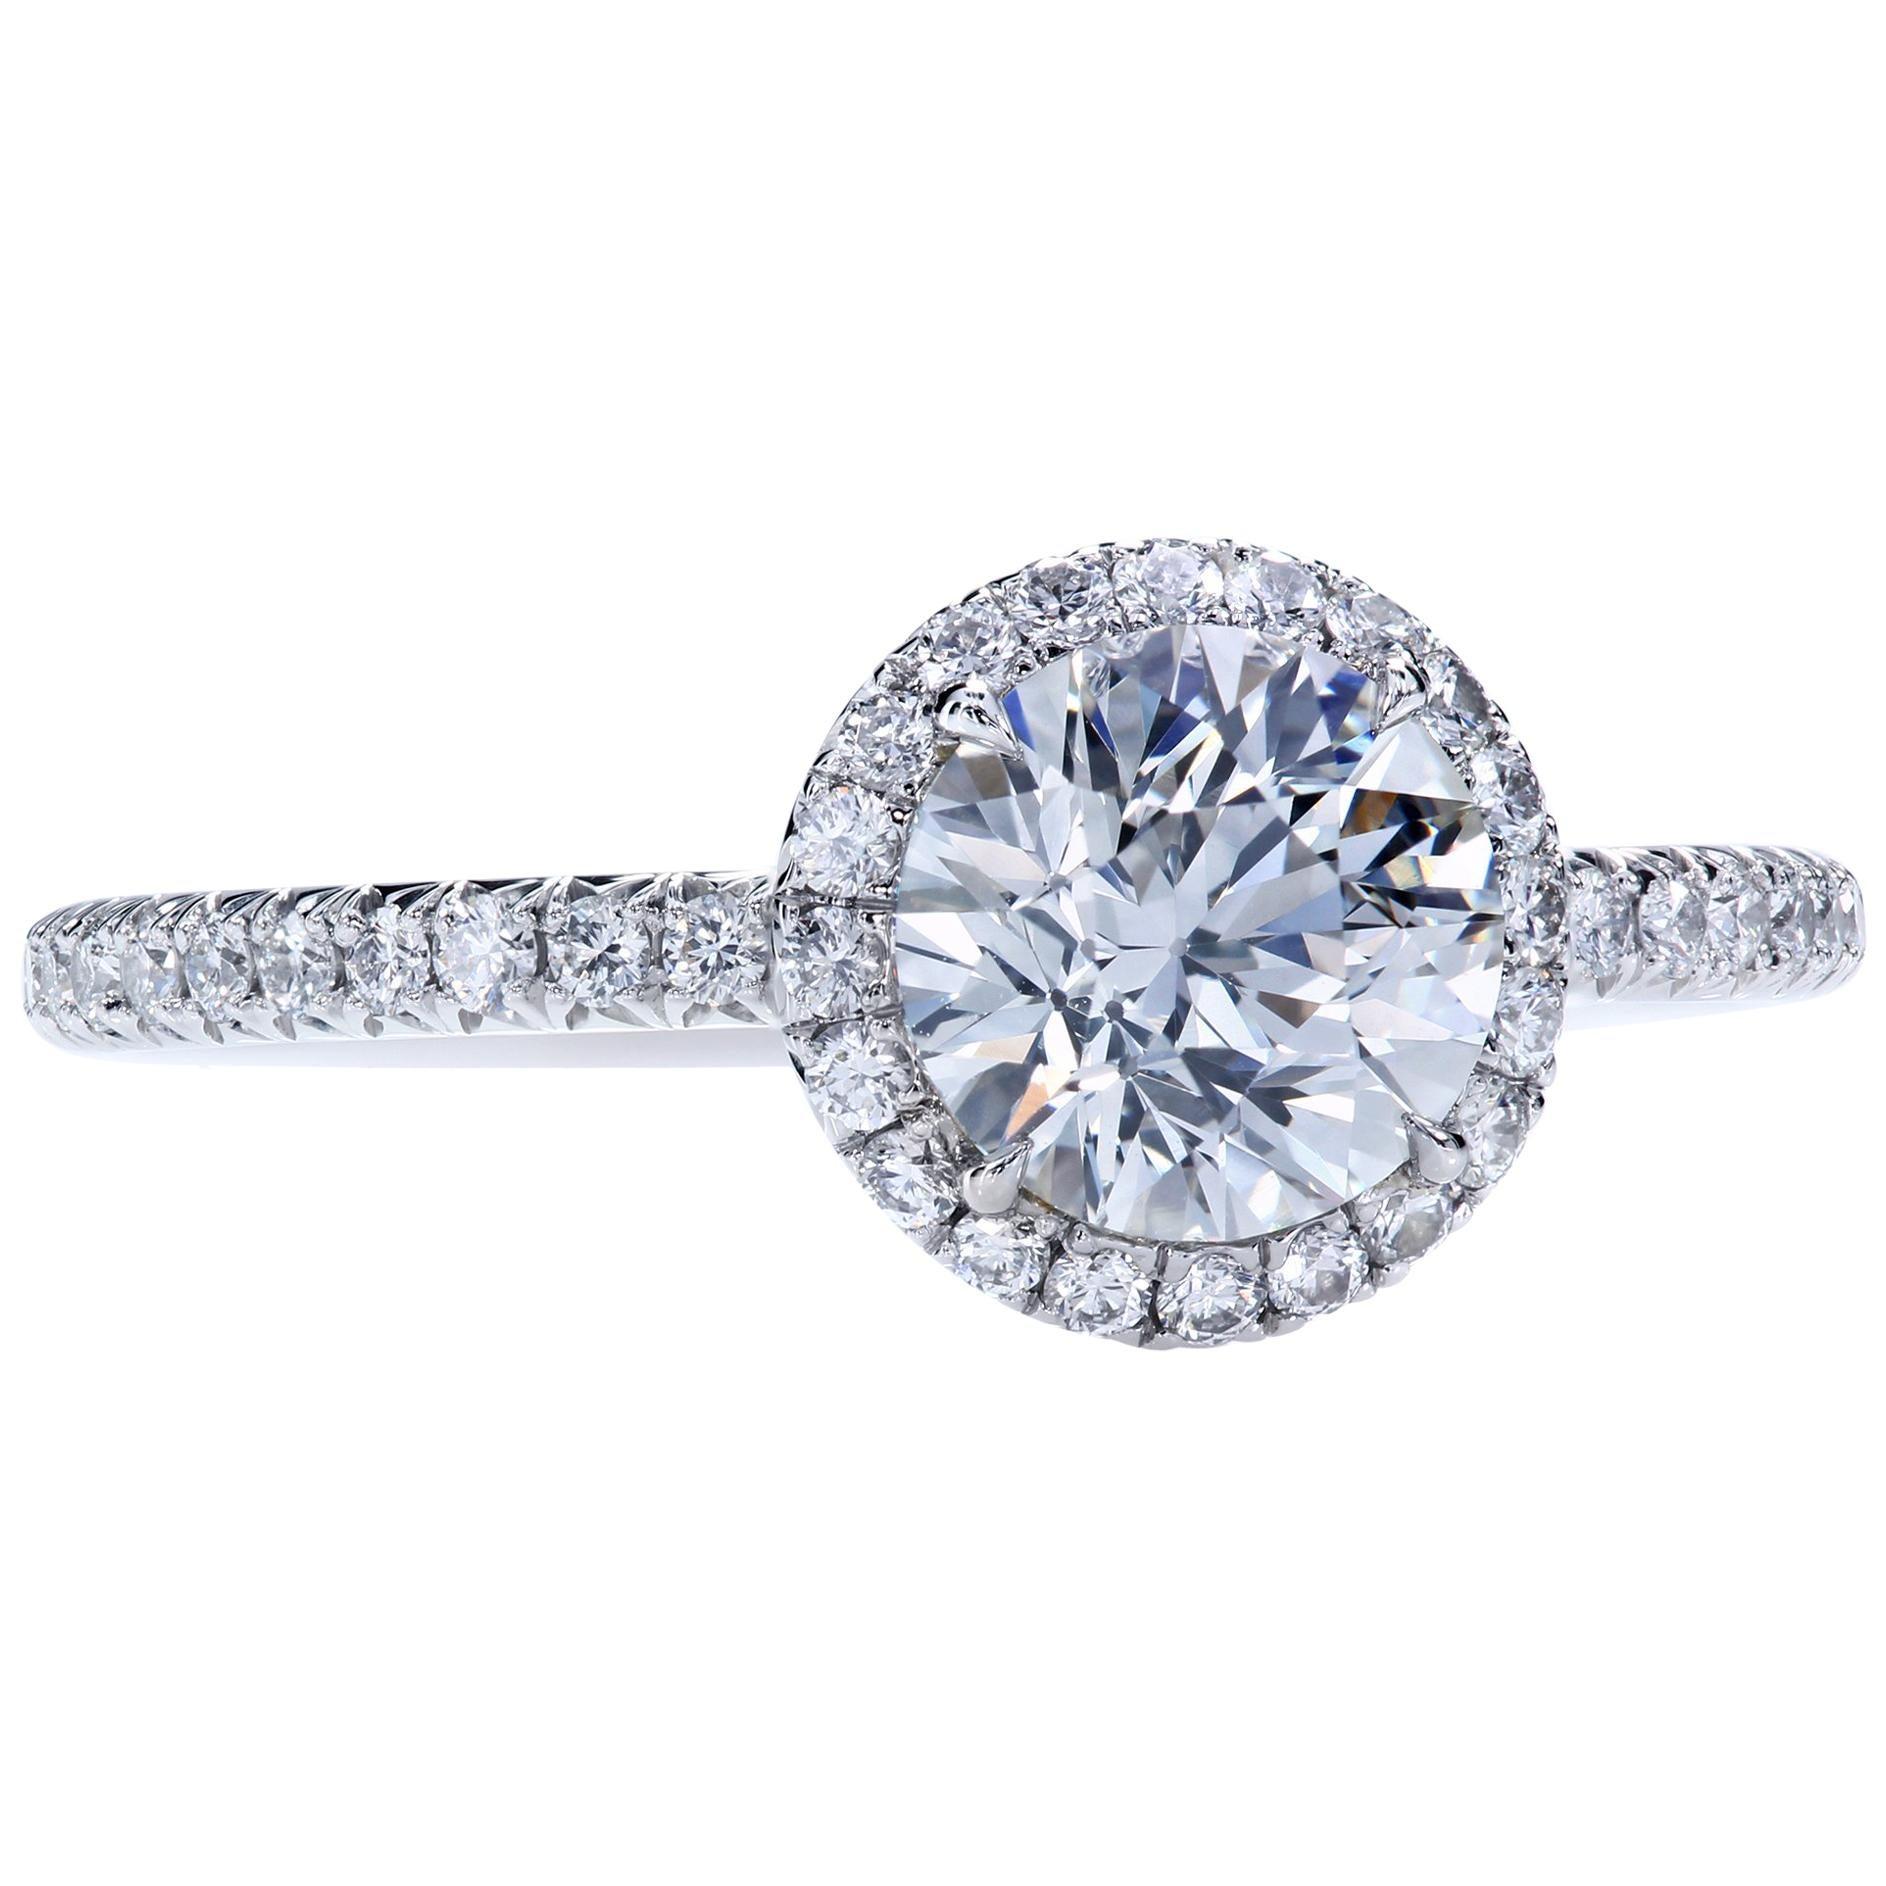 GIA Certified 1.01 Carat J/VS1 Round Diamond Platinum Engagement Halo Ring